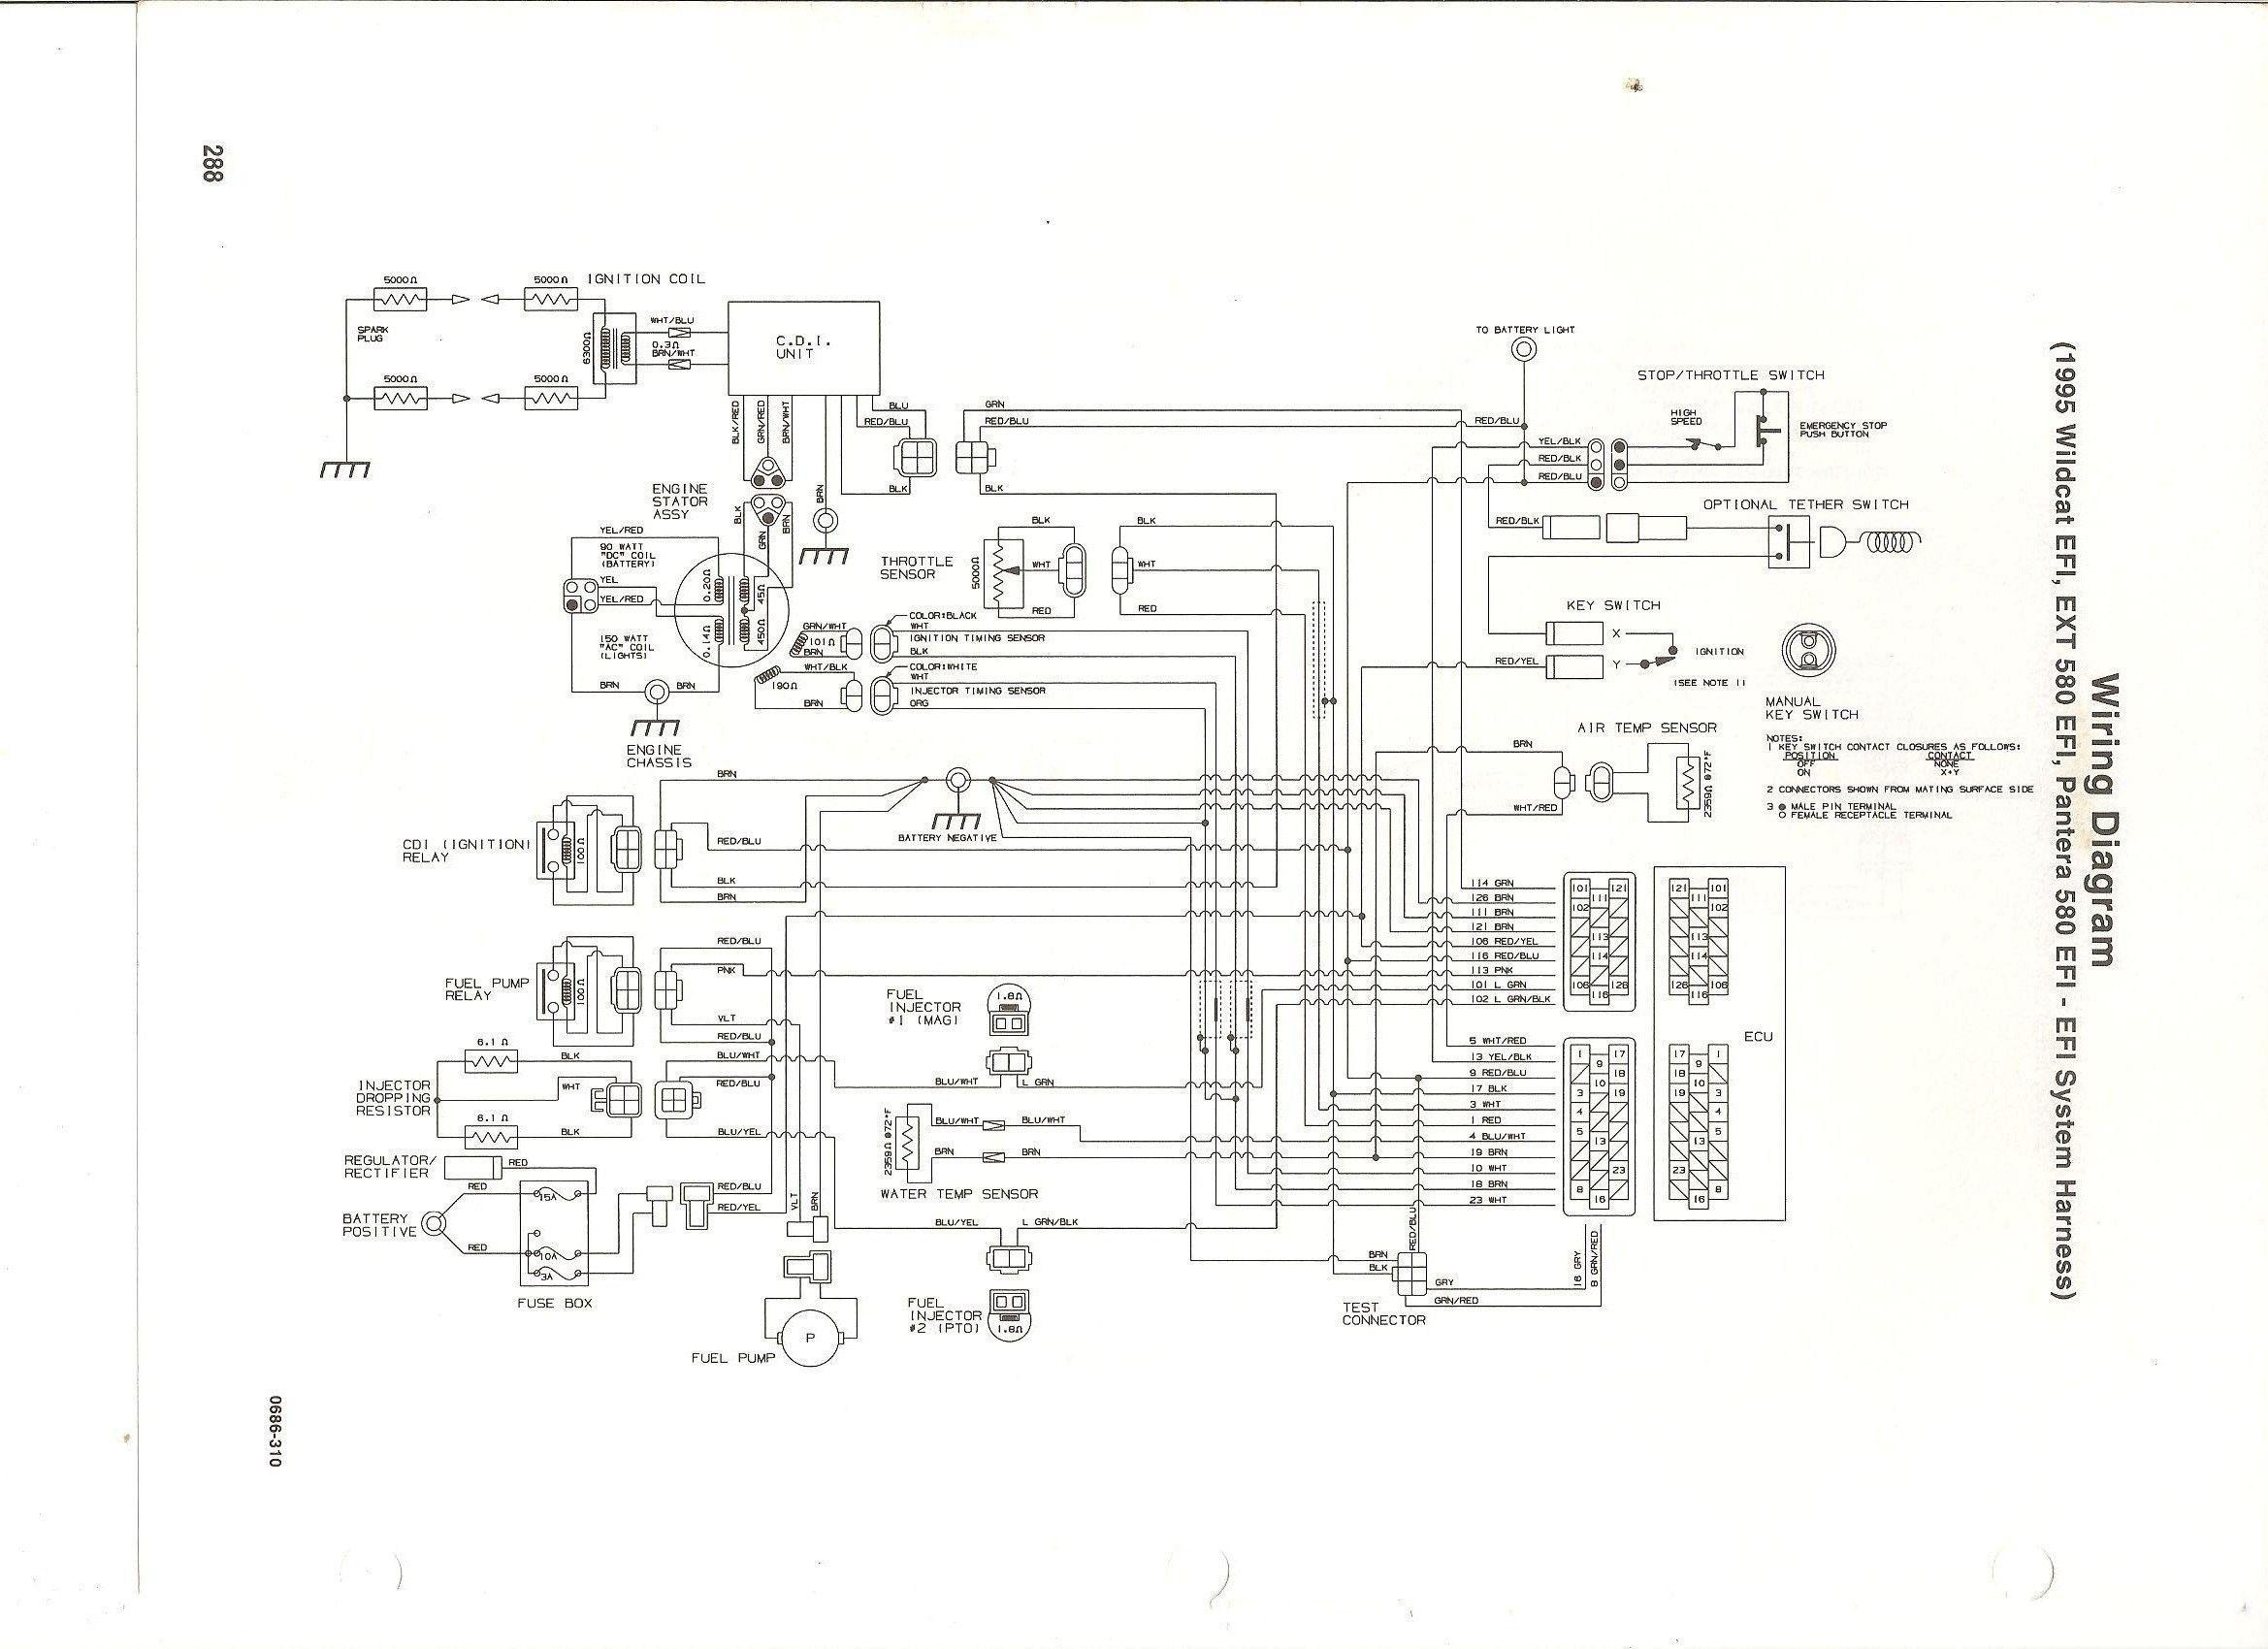 Spy 5000m Wiring Diagram